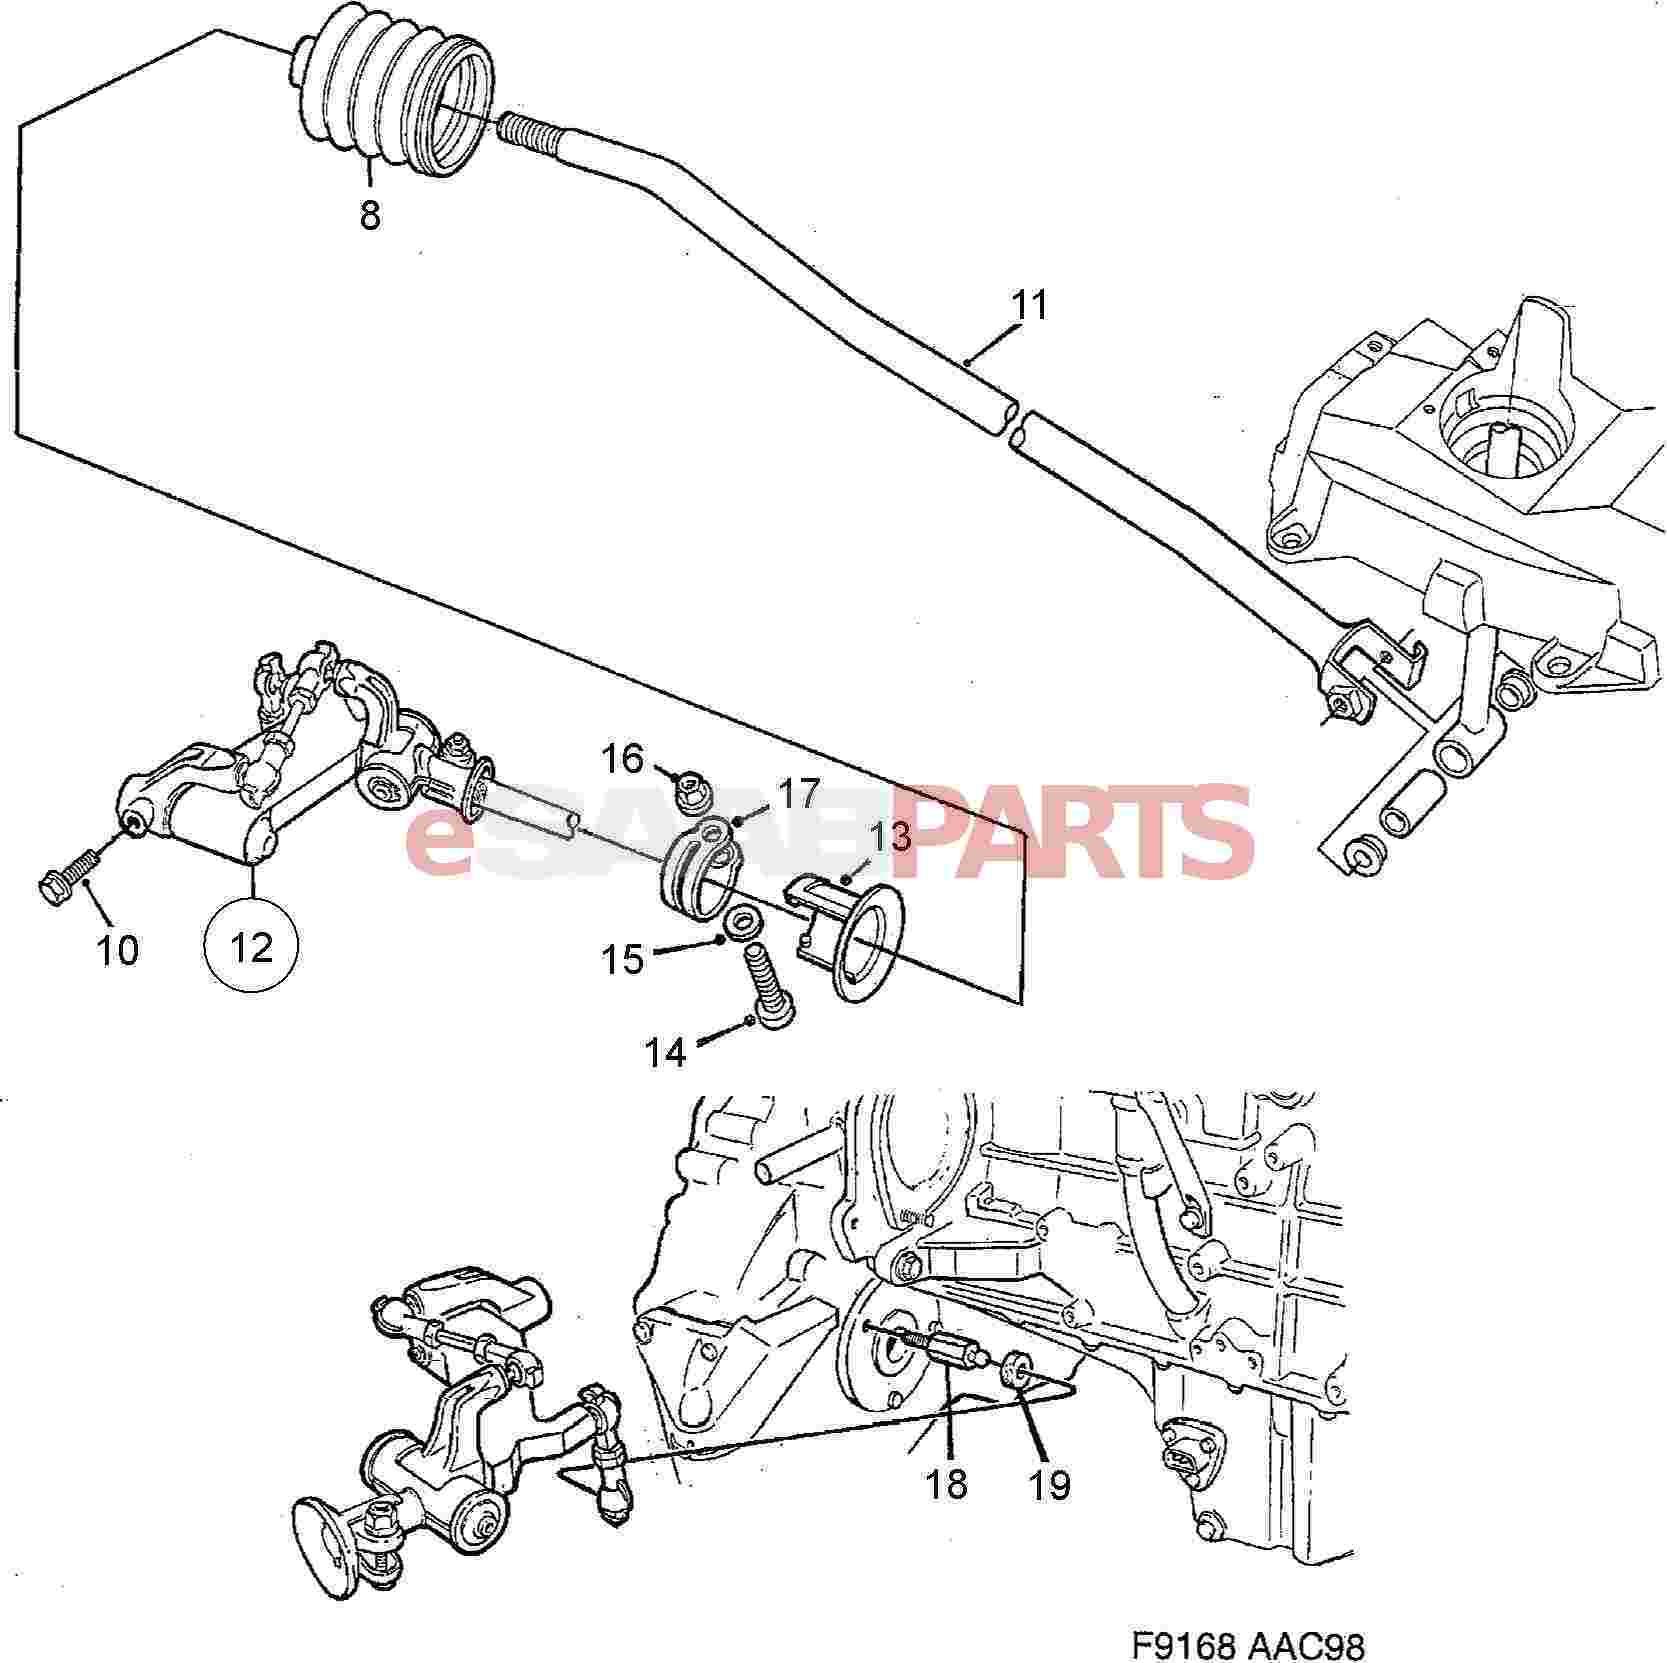 [EW_6056] Saab 9 3 Manual Transmission Diagram Wiring Diagram